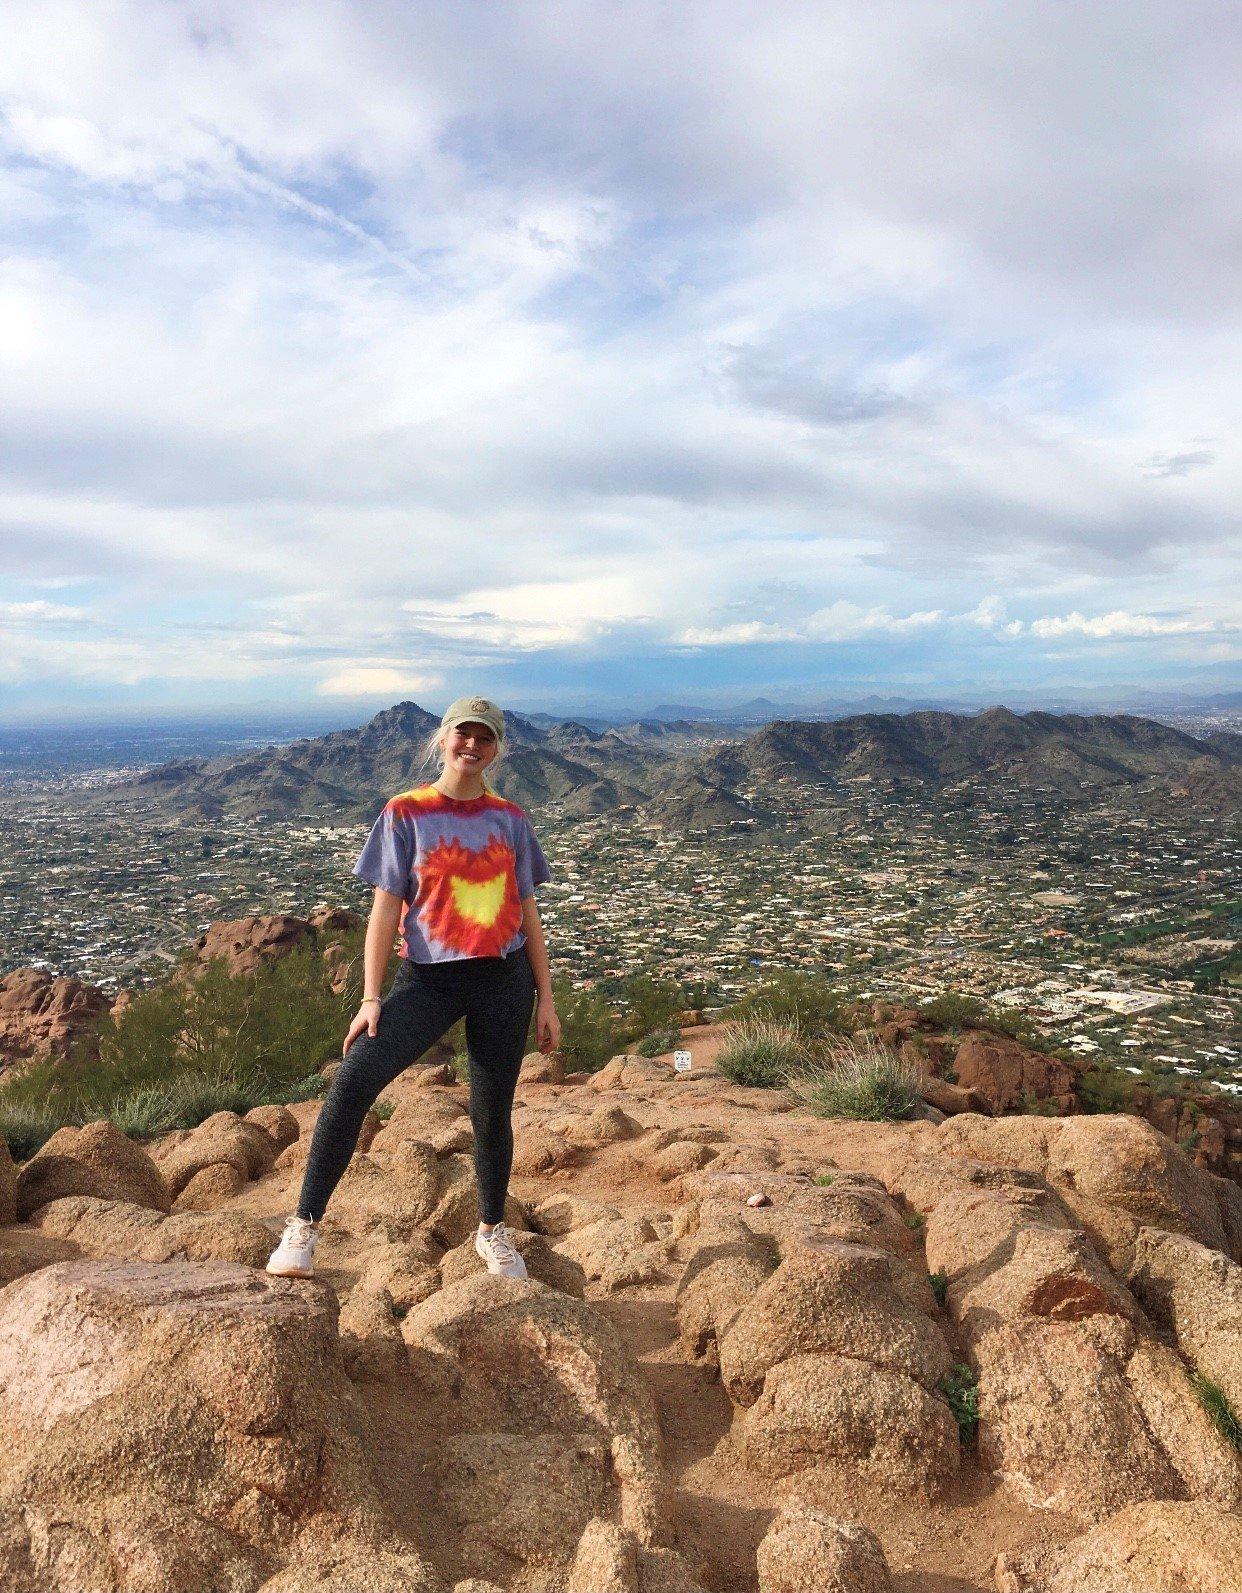 Taylor hiking